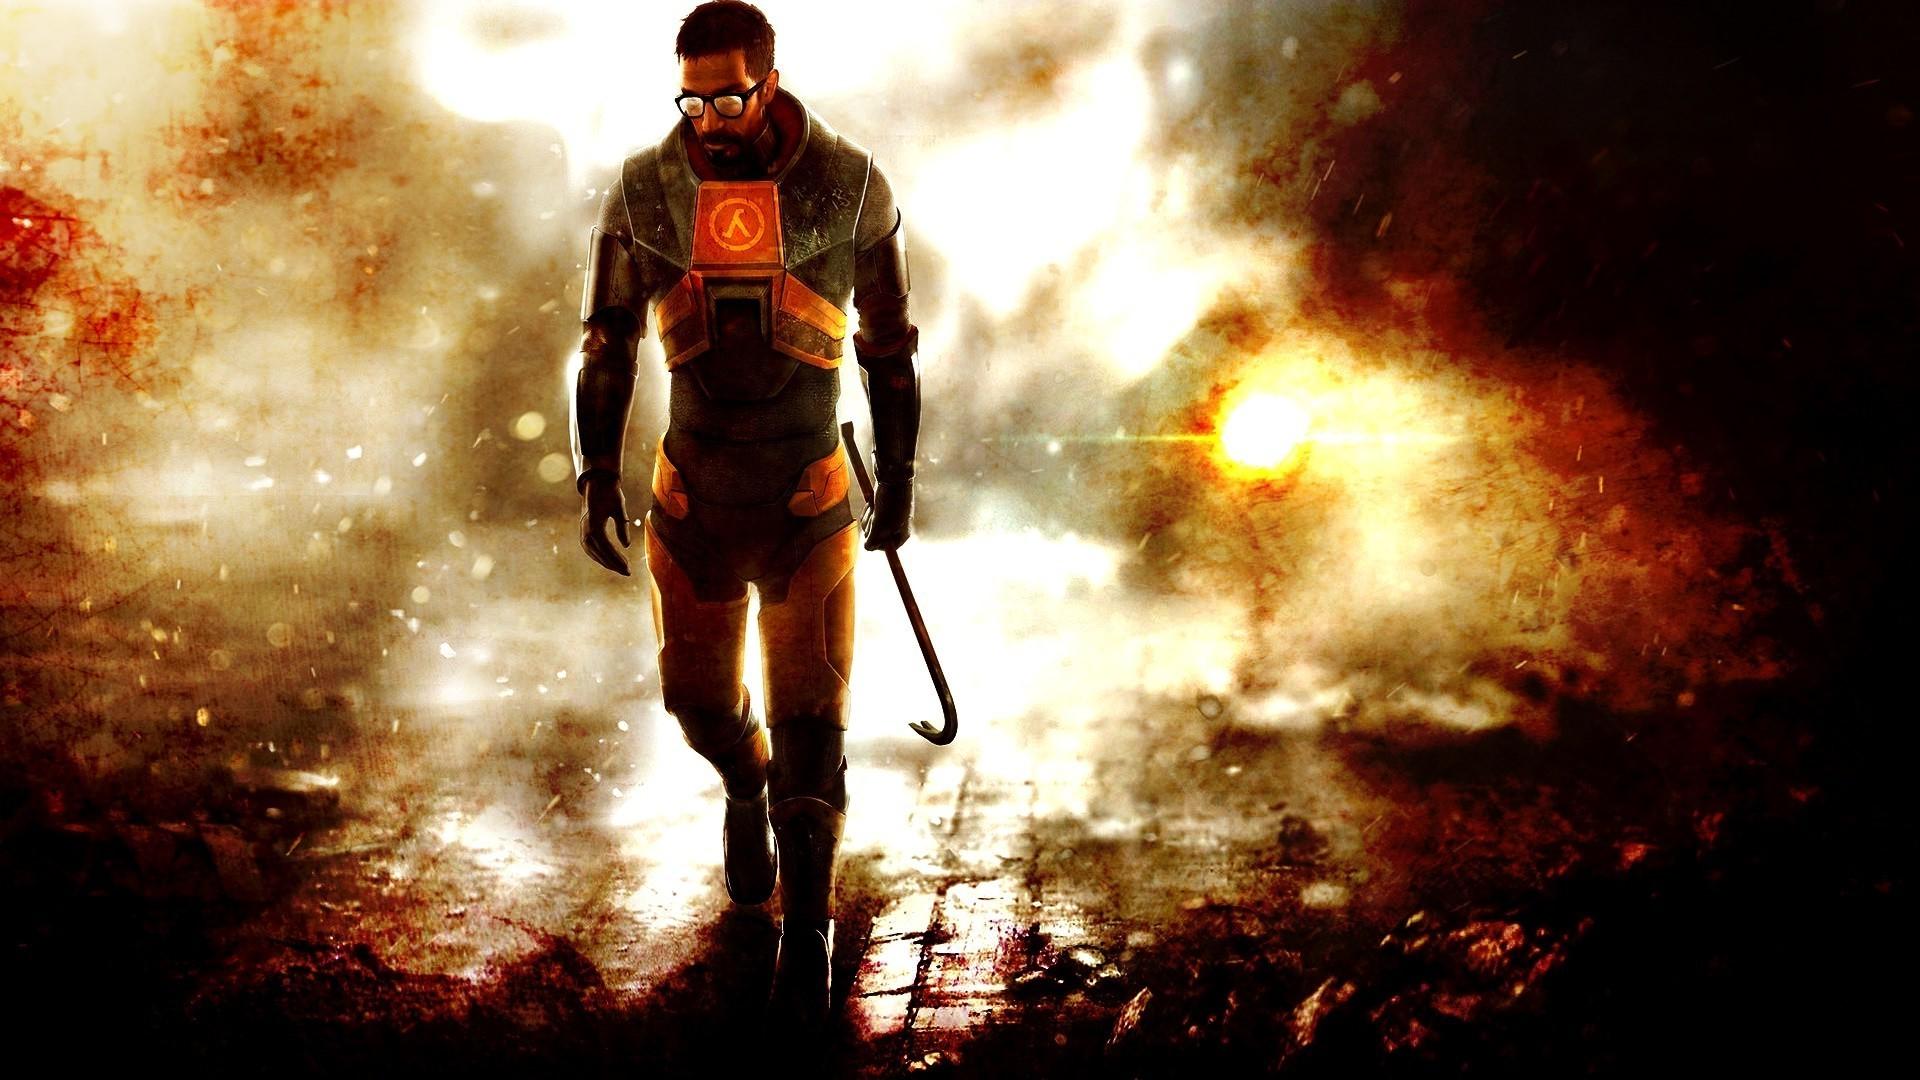 Gordon Freeman, Half Life 2 Wallpapers HD / Desktop and Mobile Backgrounds